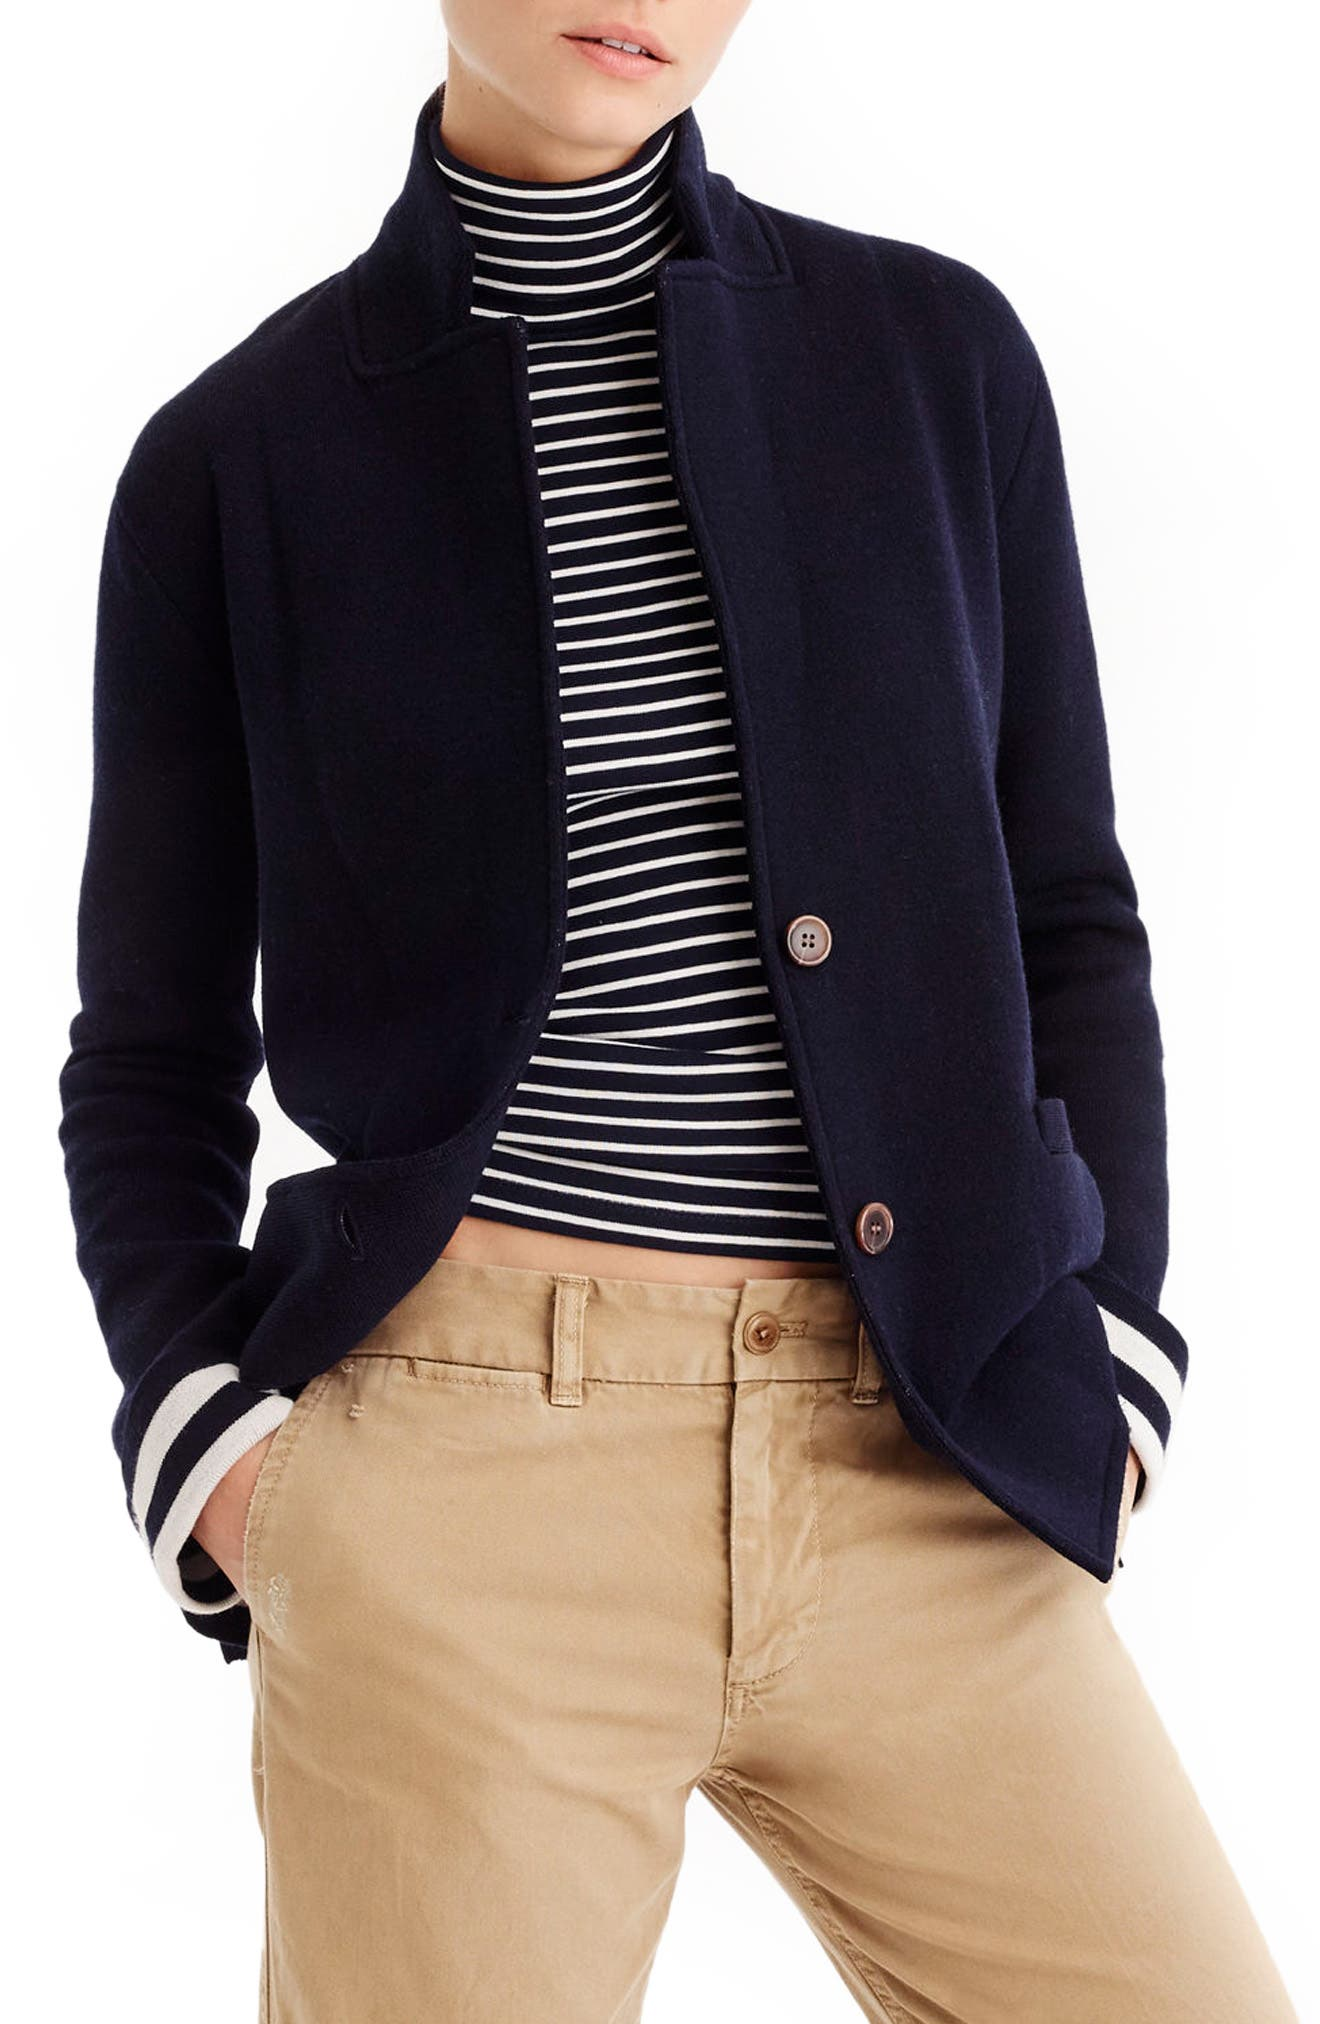 Alternate Image 1 Selected - J.Crew Stripe Lining Merino Wool Sweater Blazer